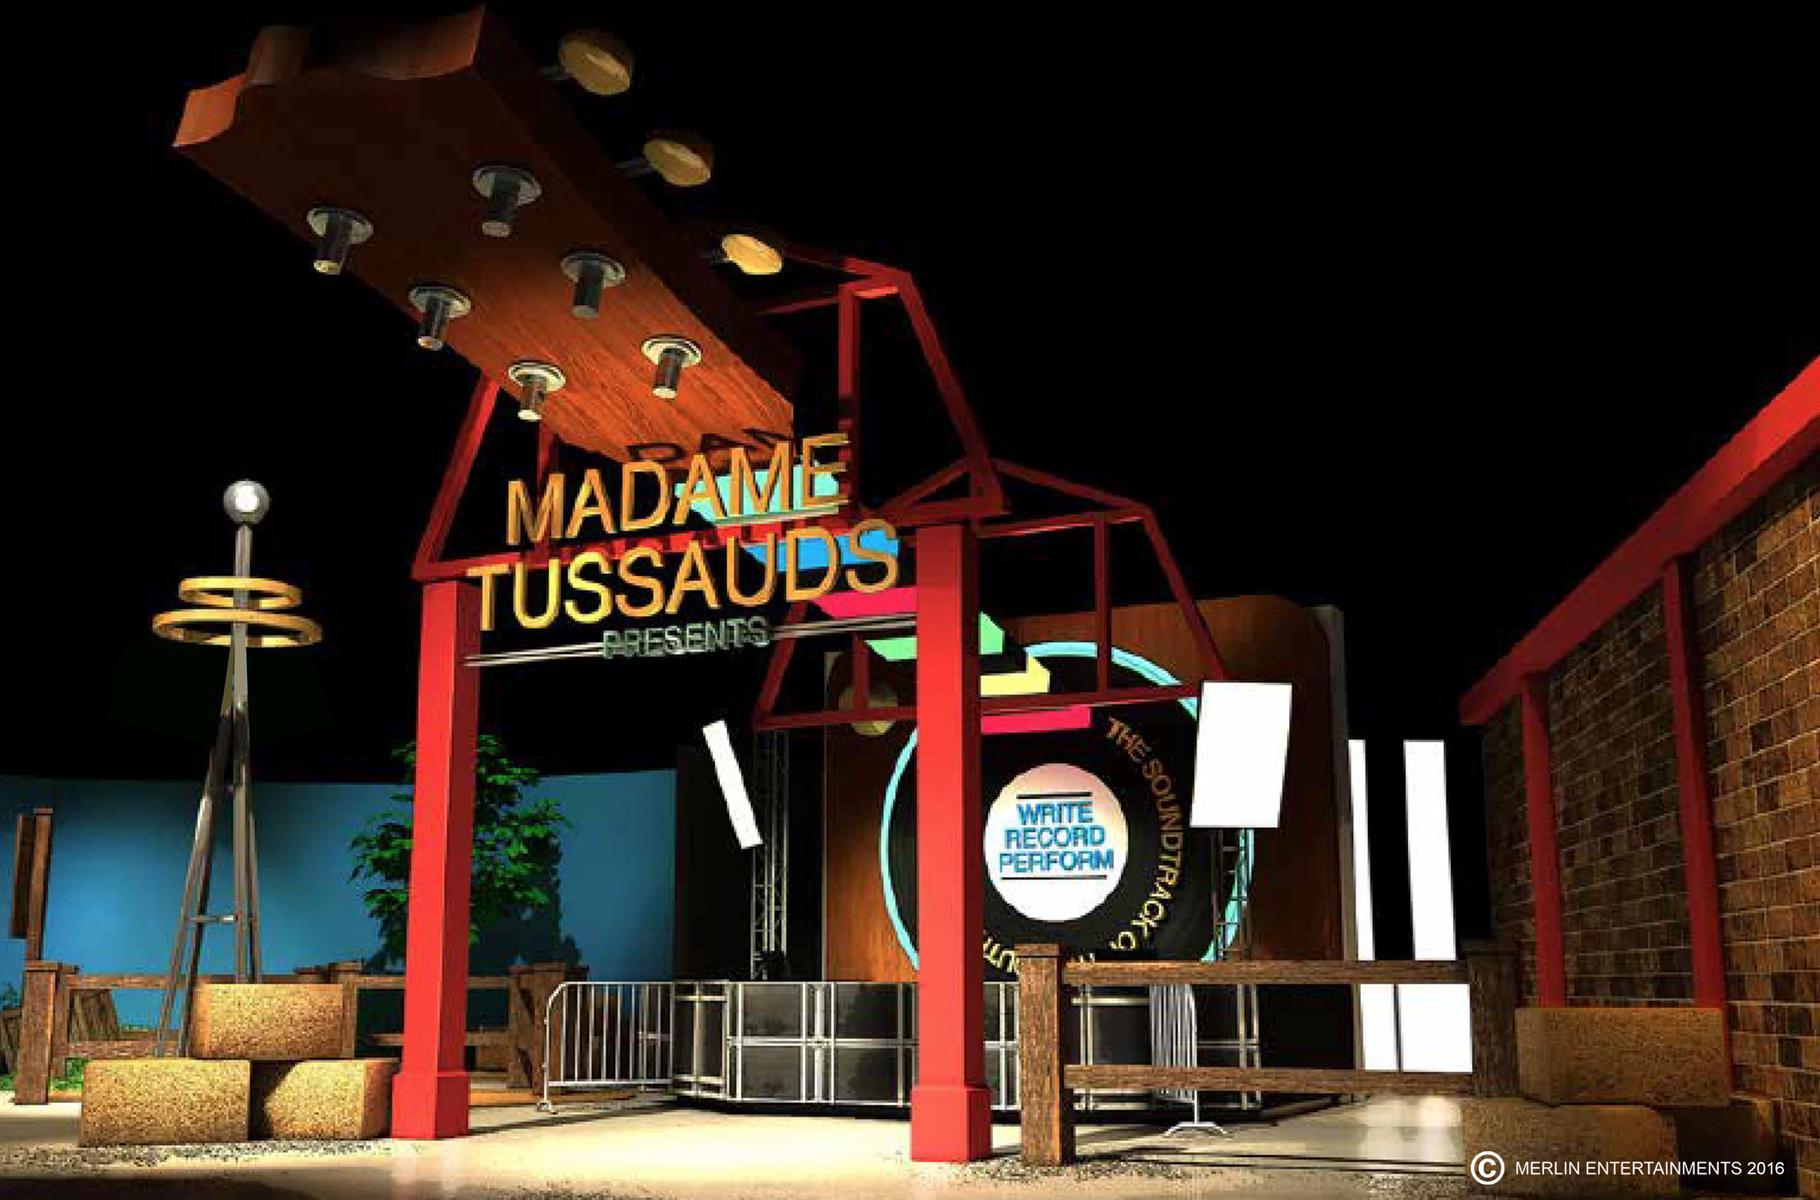 Madame Tussauds to Open in Nashville